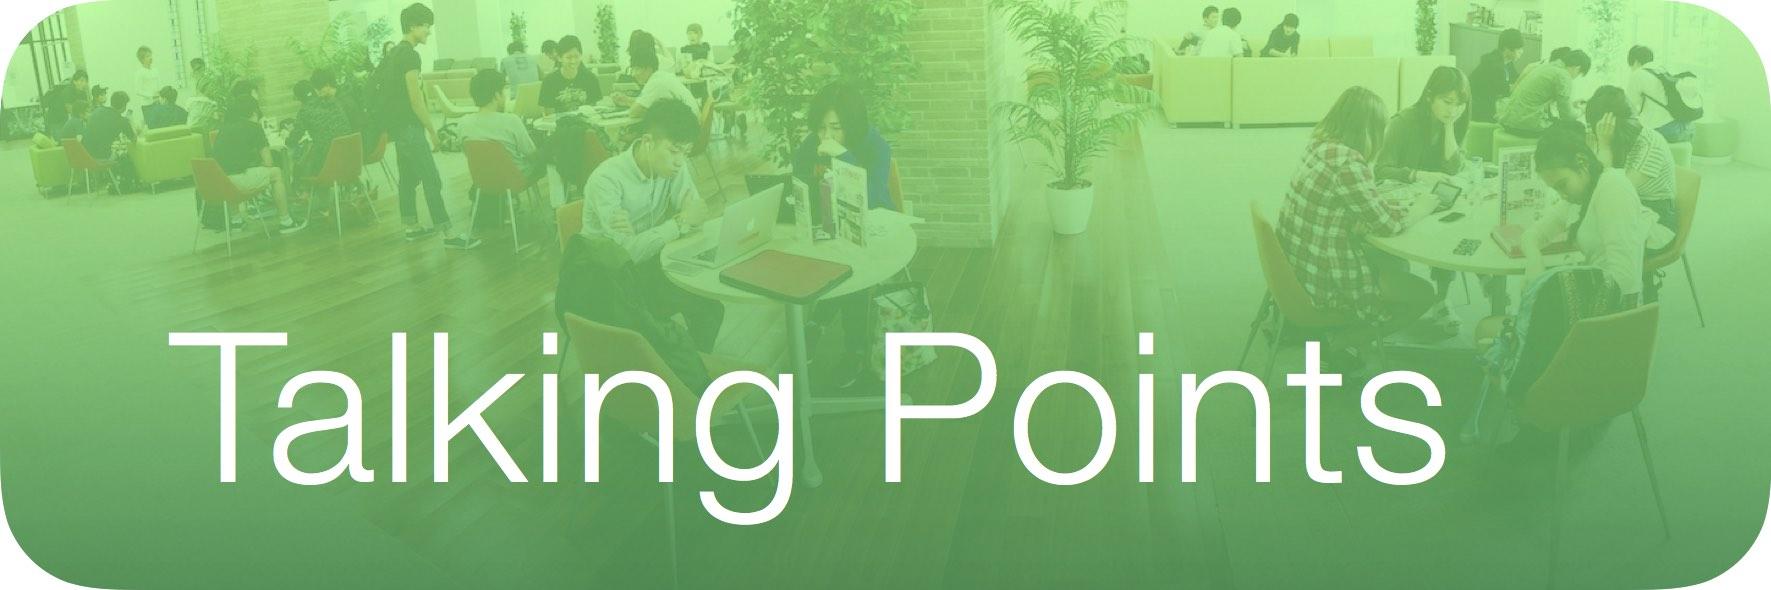 talking-points-button